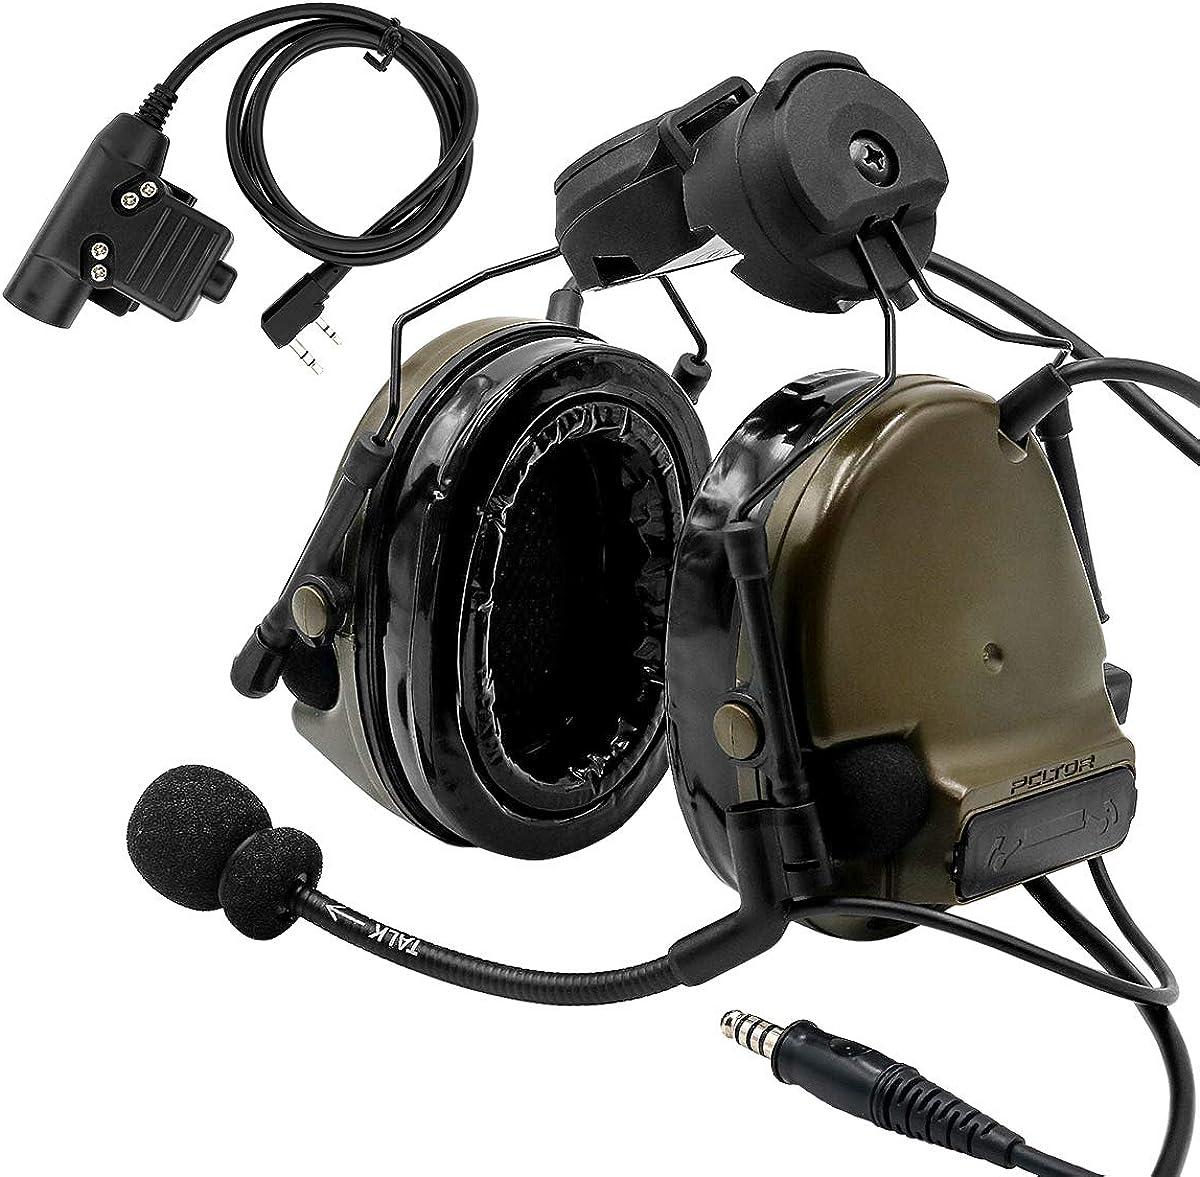 TAC-SKY COMTA III Max 71% OFF Helmet Tactical Minneapolis Mall Side E Airsoft Rail headphones